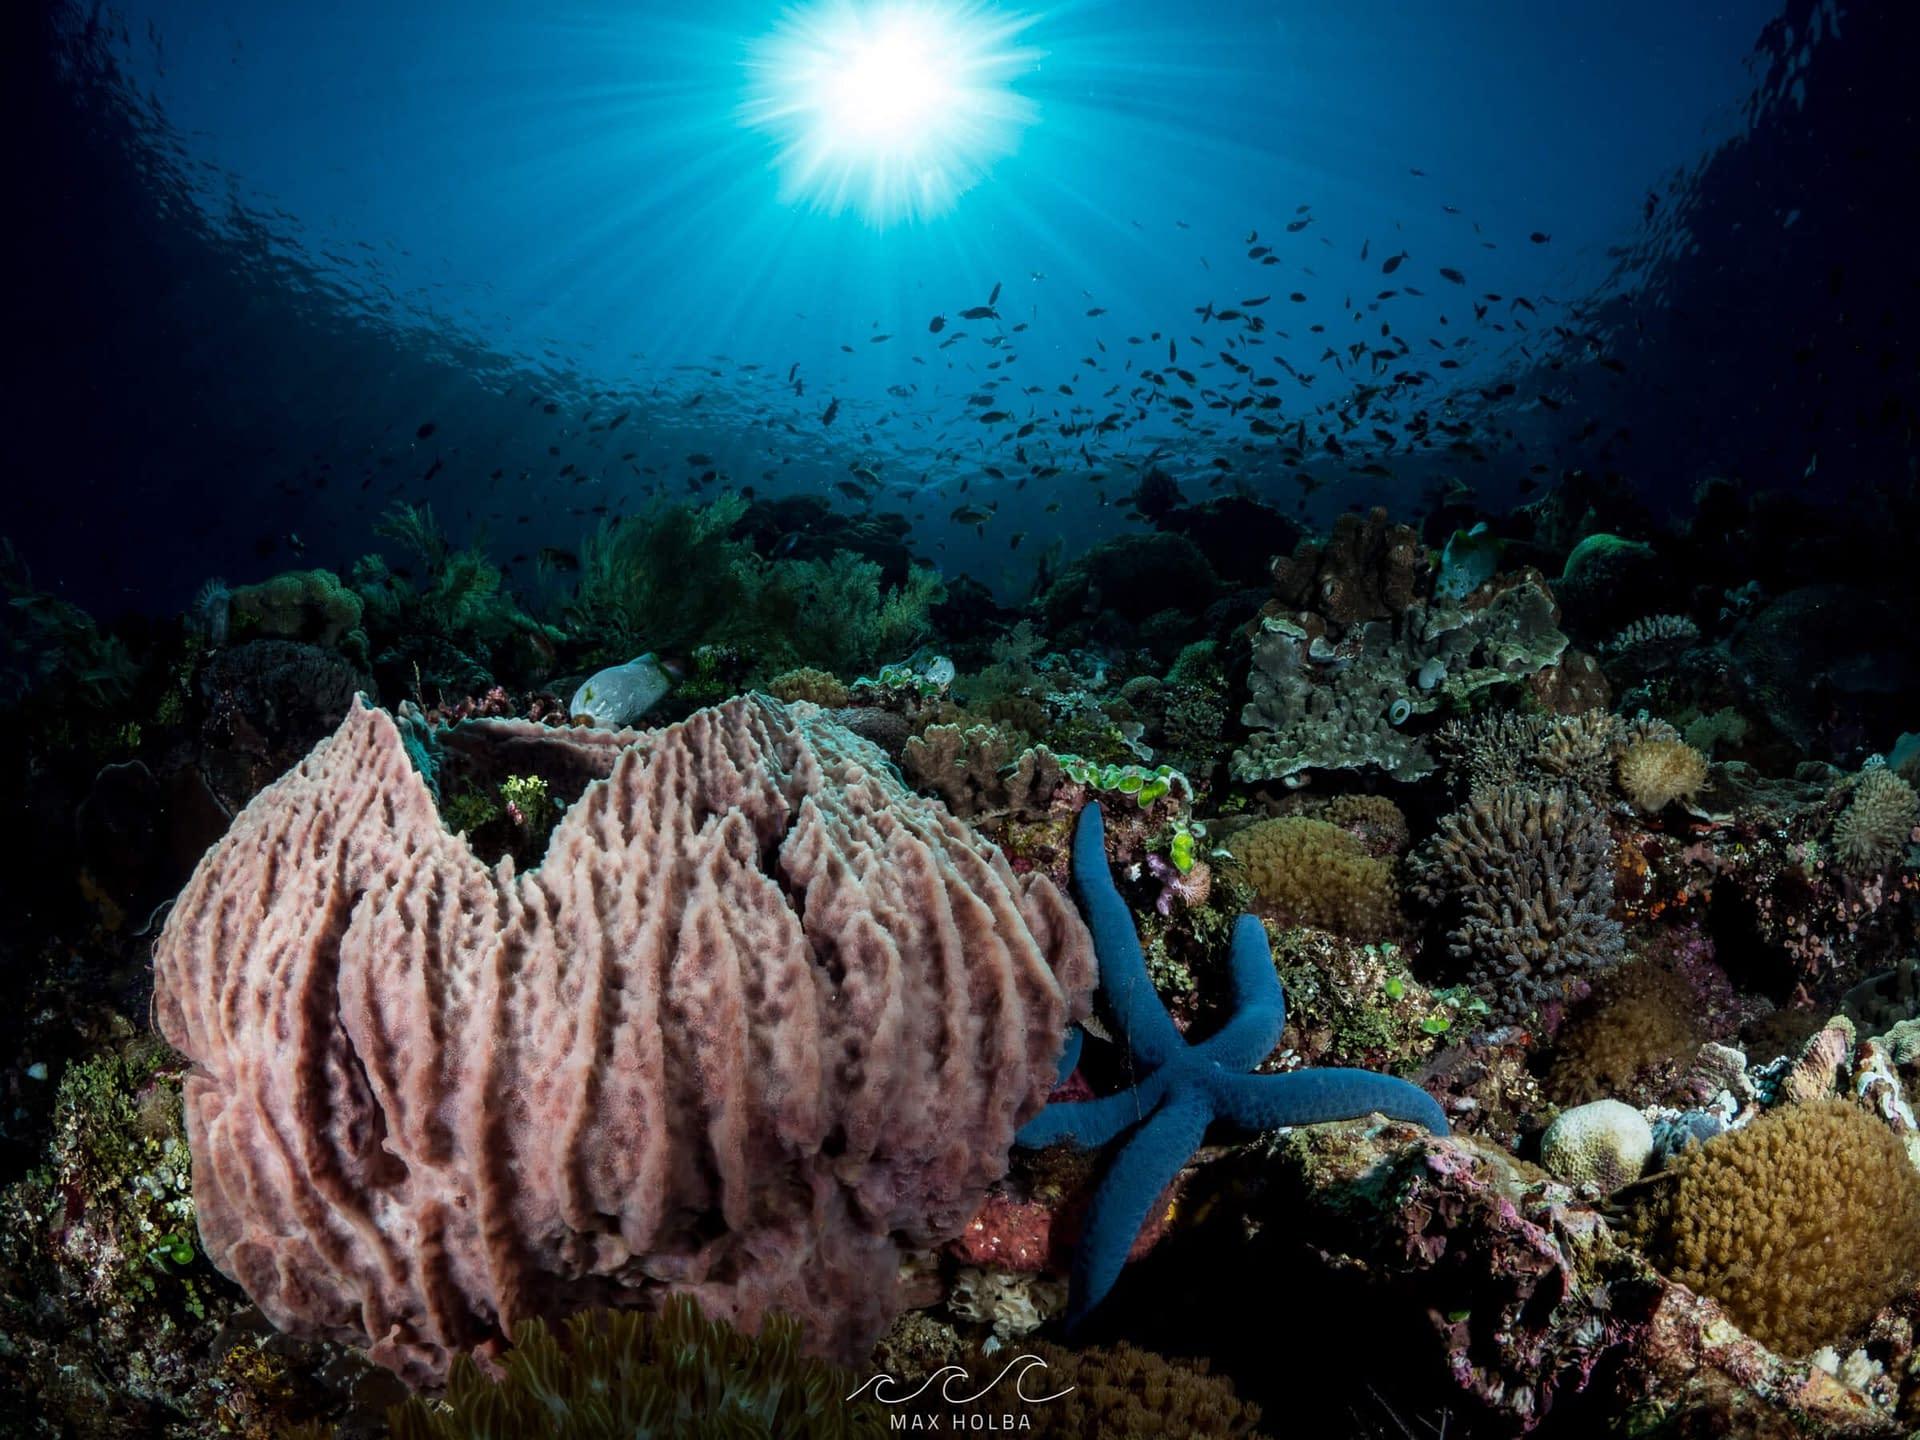 Sunball Reefscape Max Holba